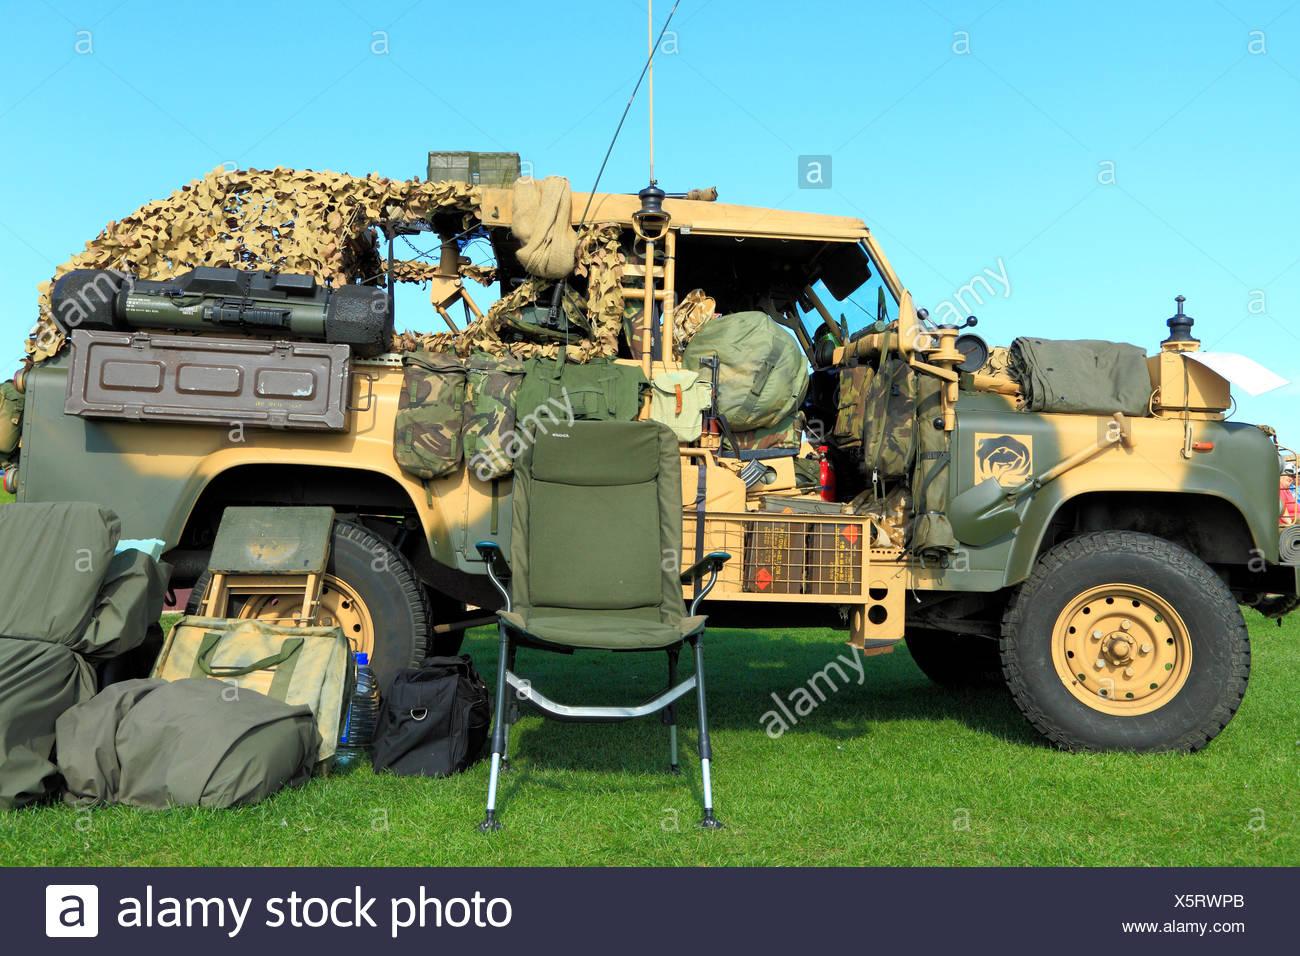 British Army, vintage vehicle, troop carrier, military, vehicles,England, UK - Stock Image